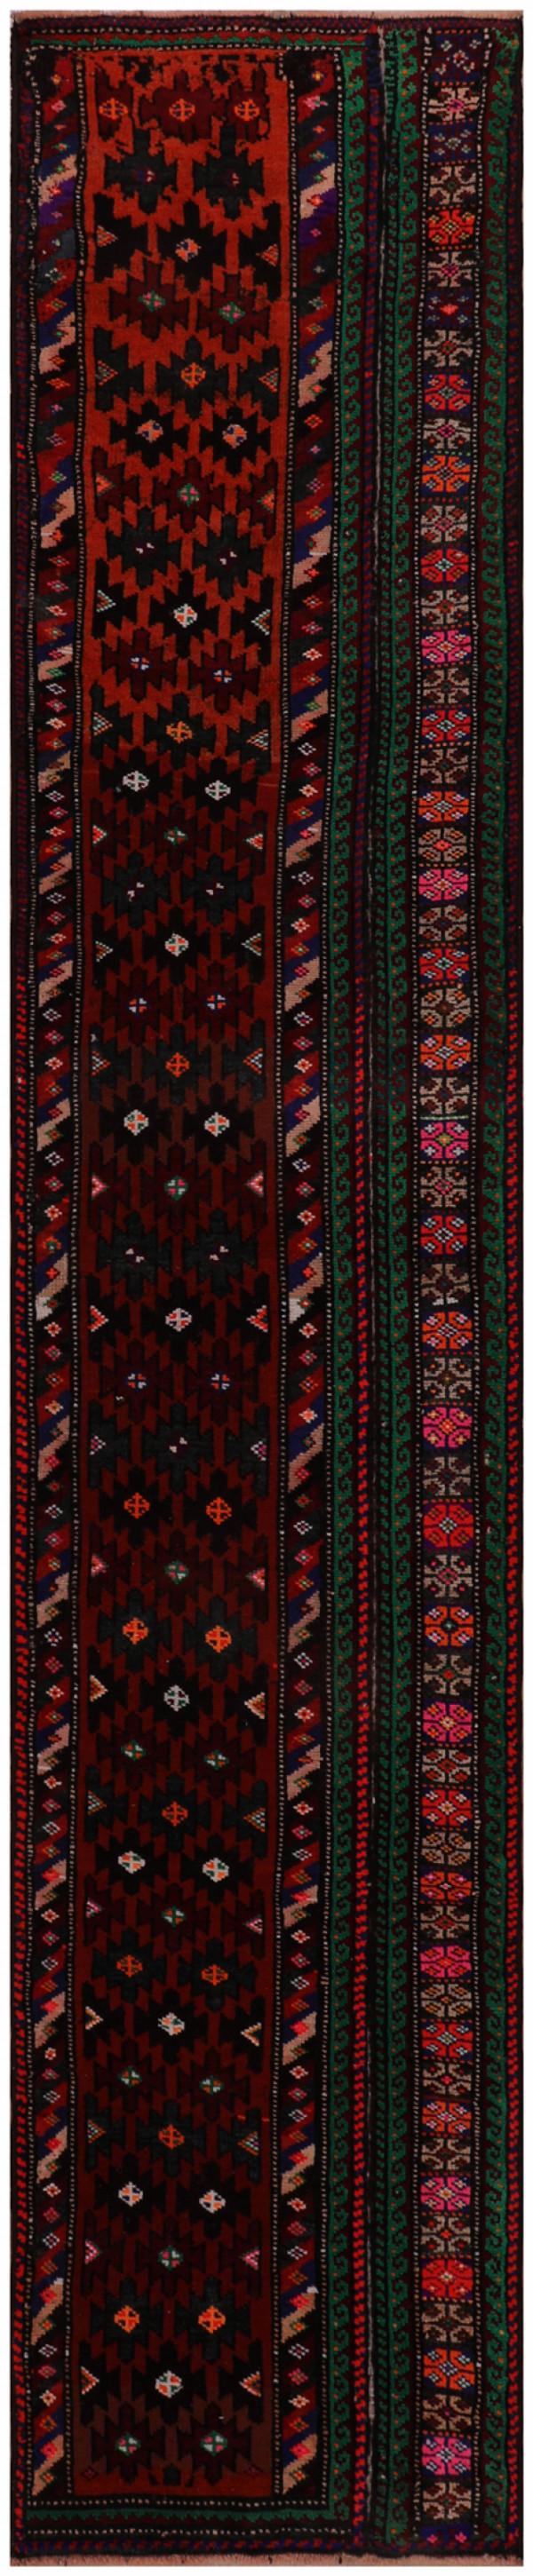 #52113 Cotton Persian Rug